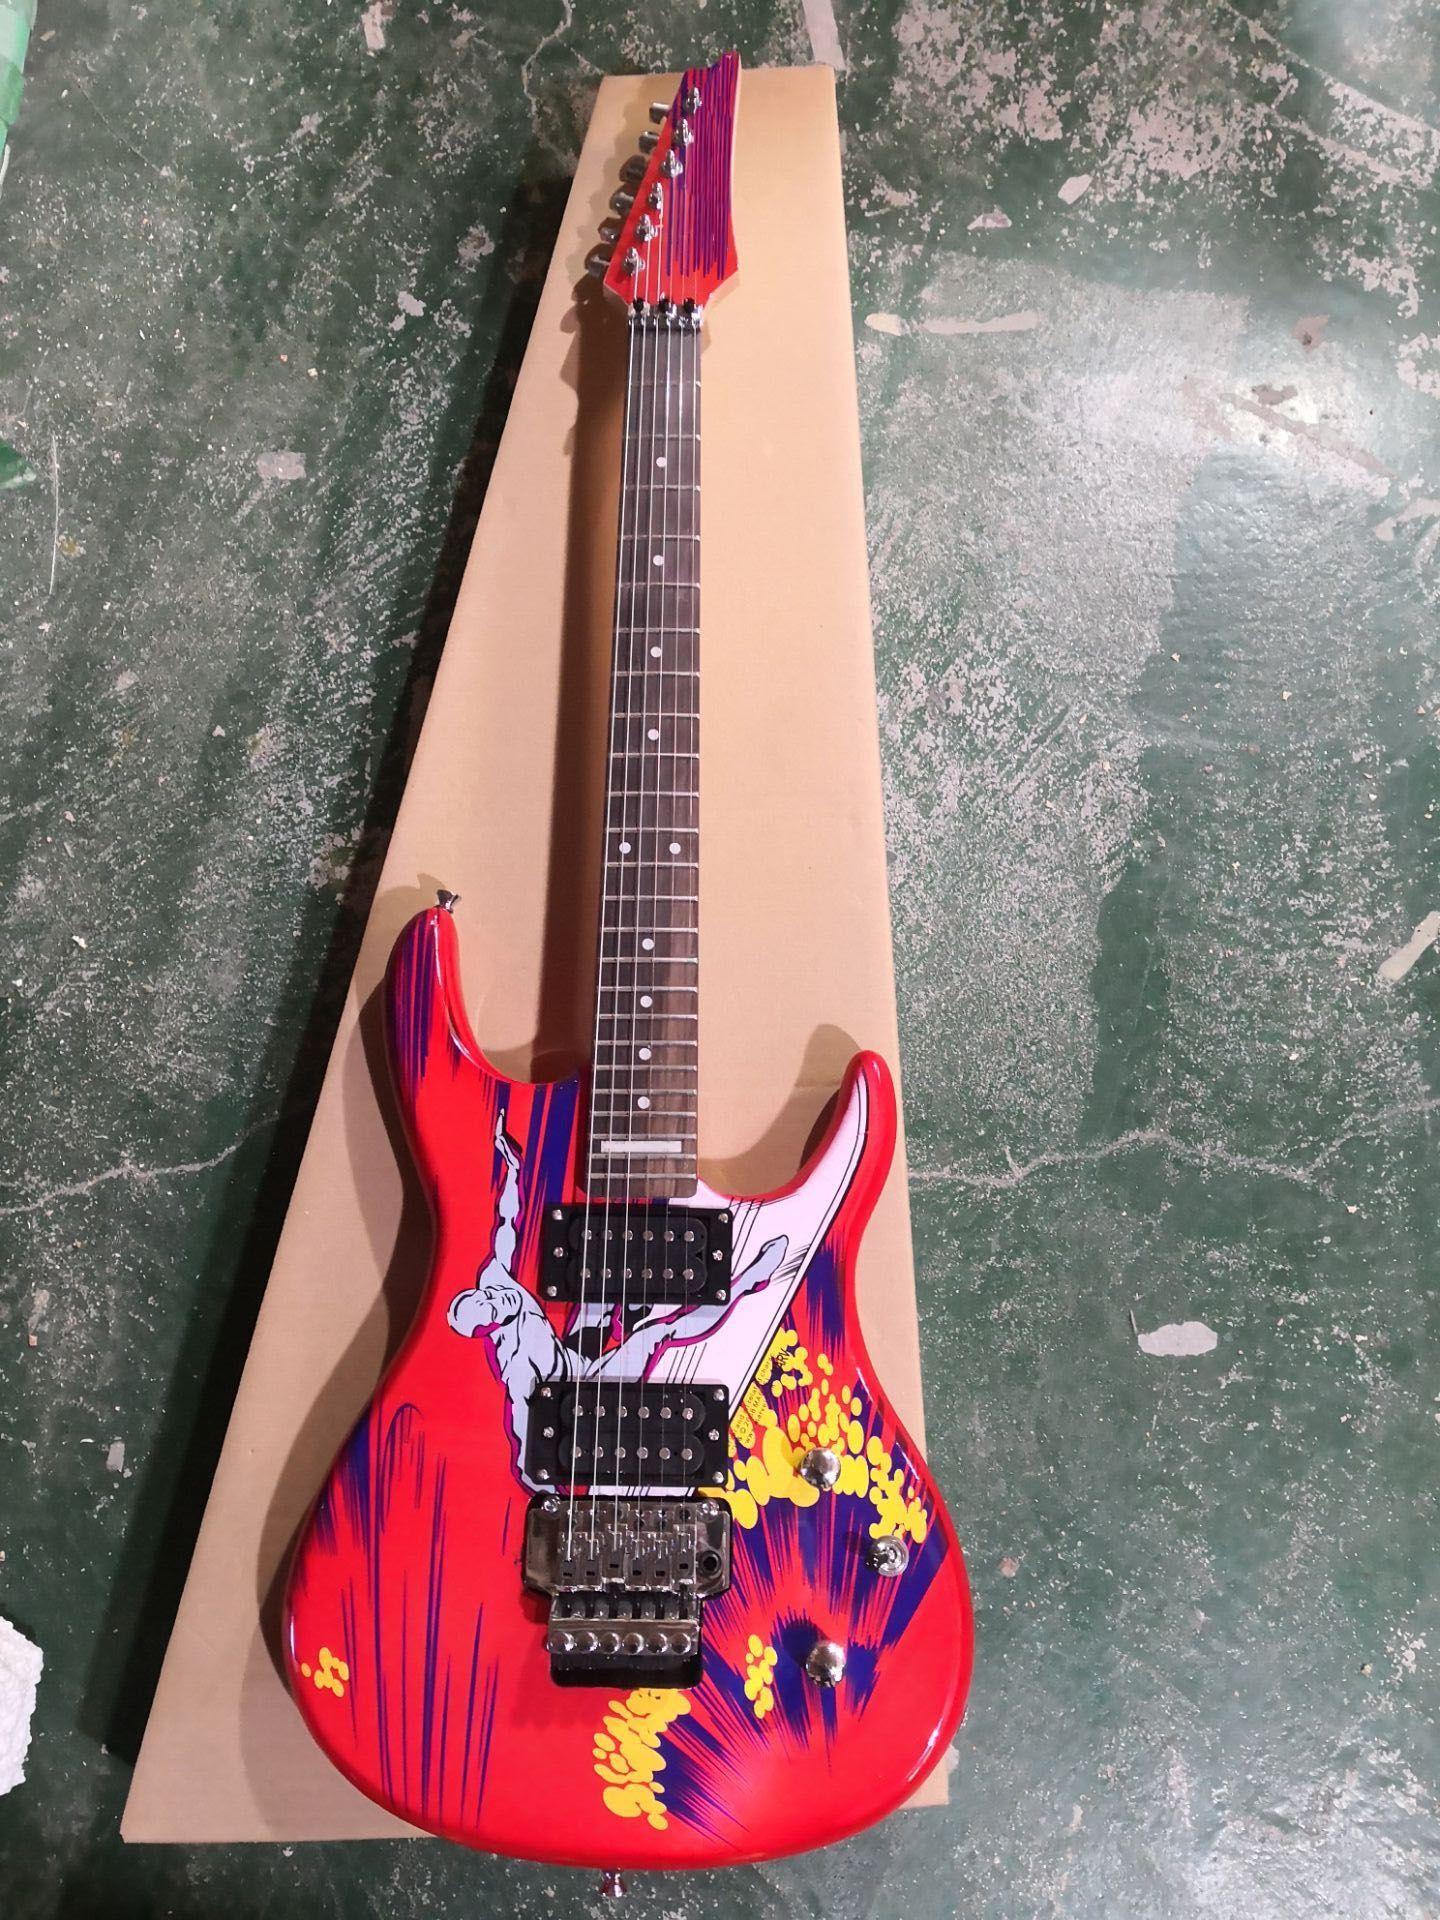 Изготовленные на заказ 20-й годовщины JS20S подписали Joe Satriani Serfing W / Alien Electric Guitar Joe Satriani Autographe